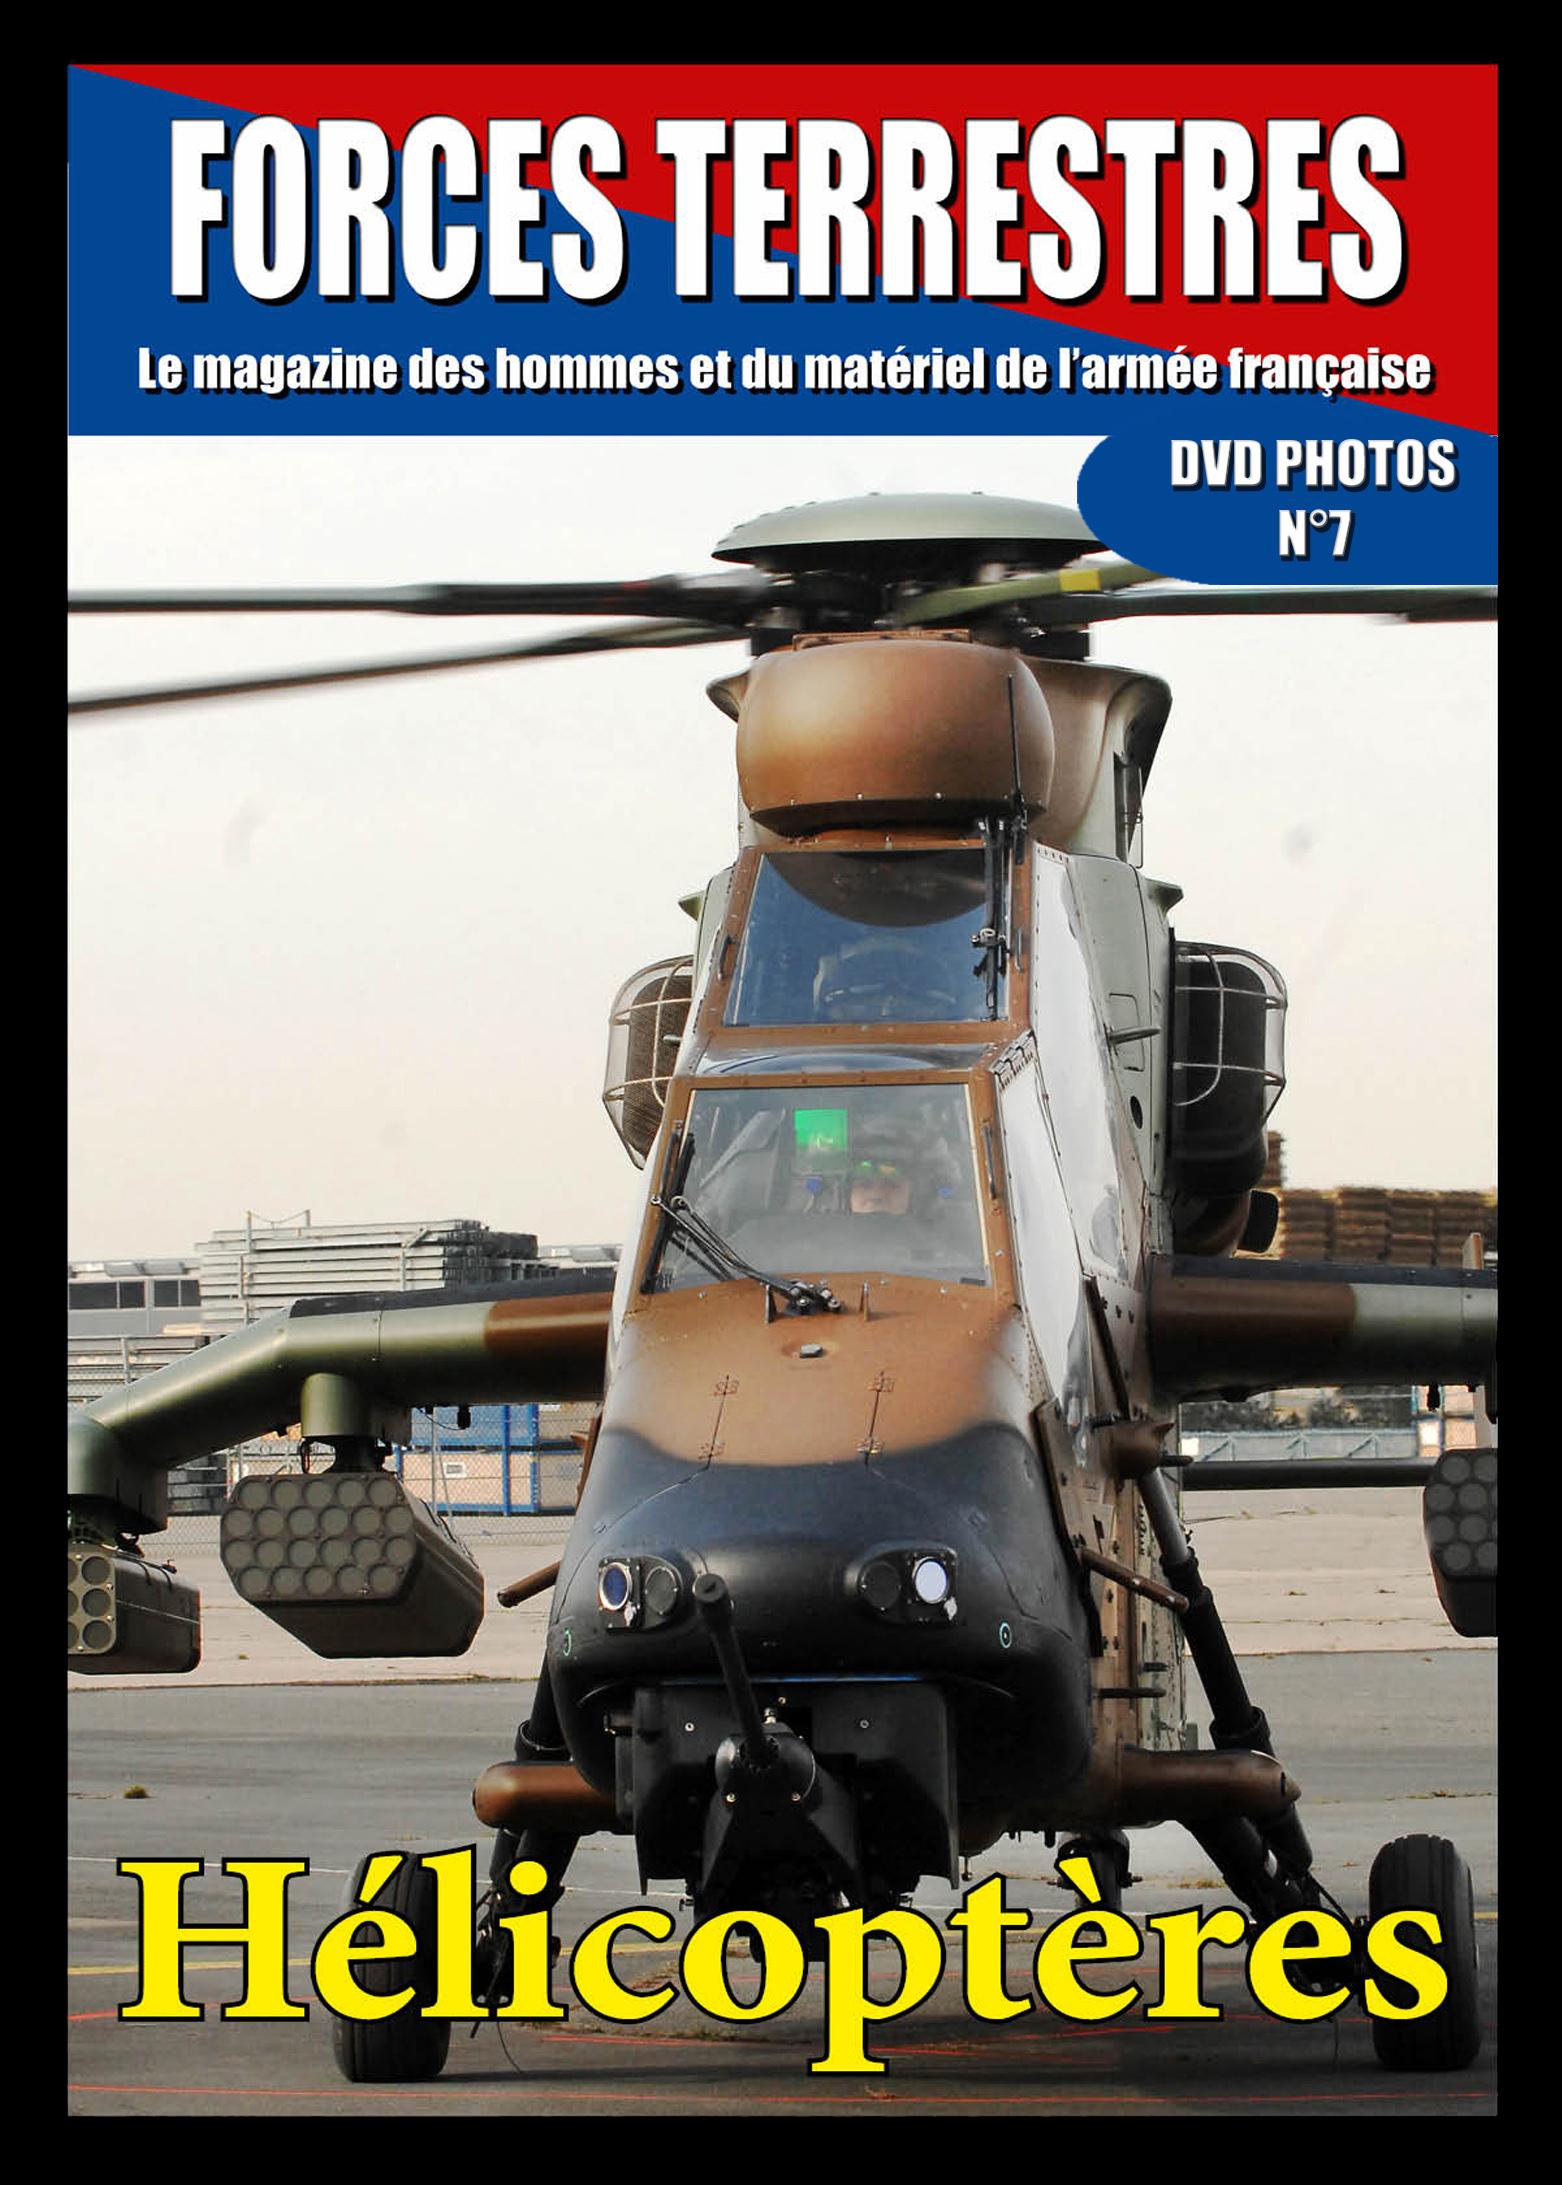 DVD  N°7 Hélicoptères